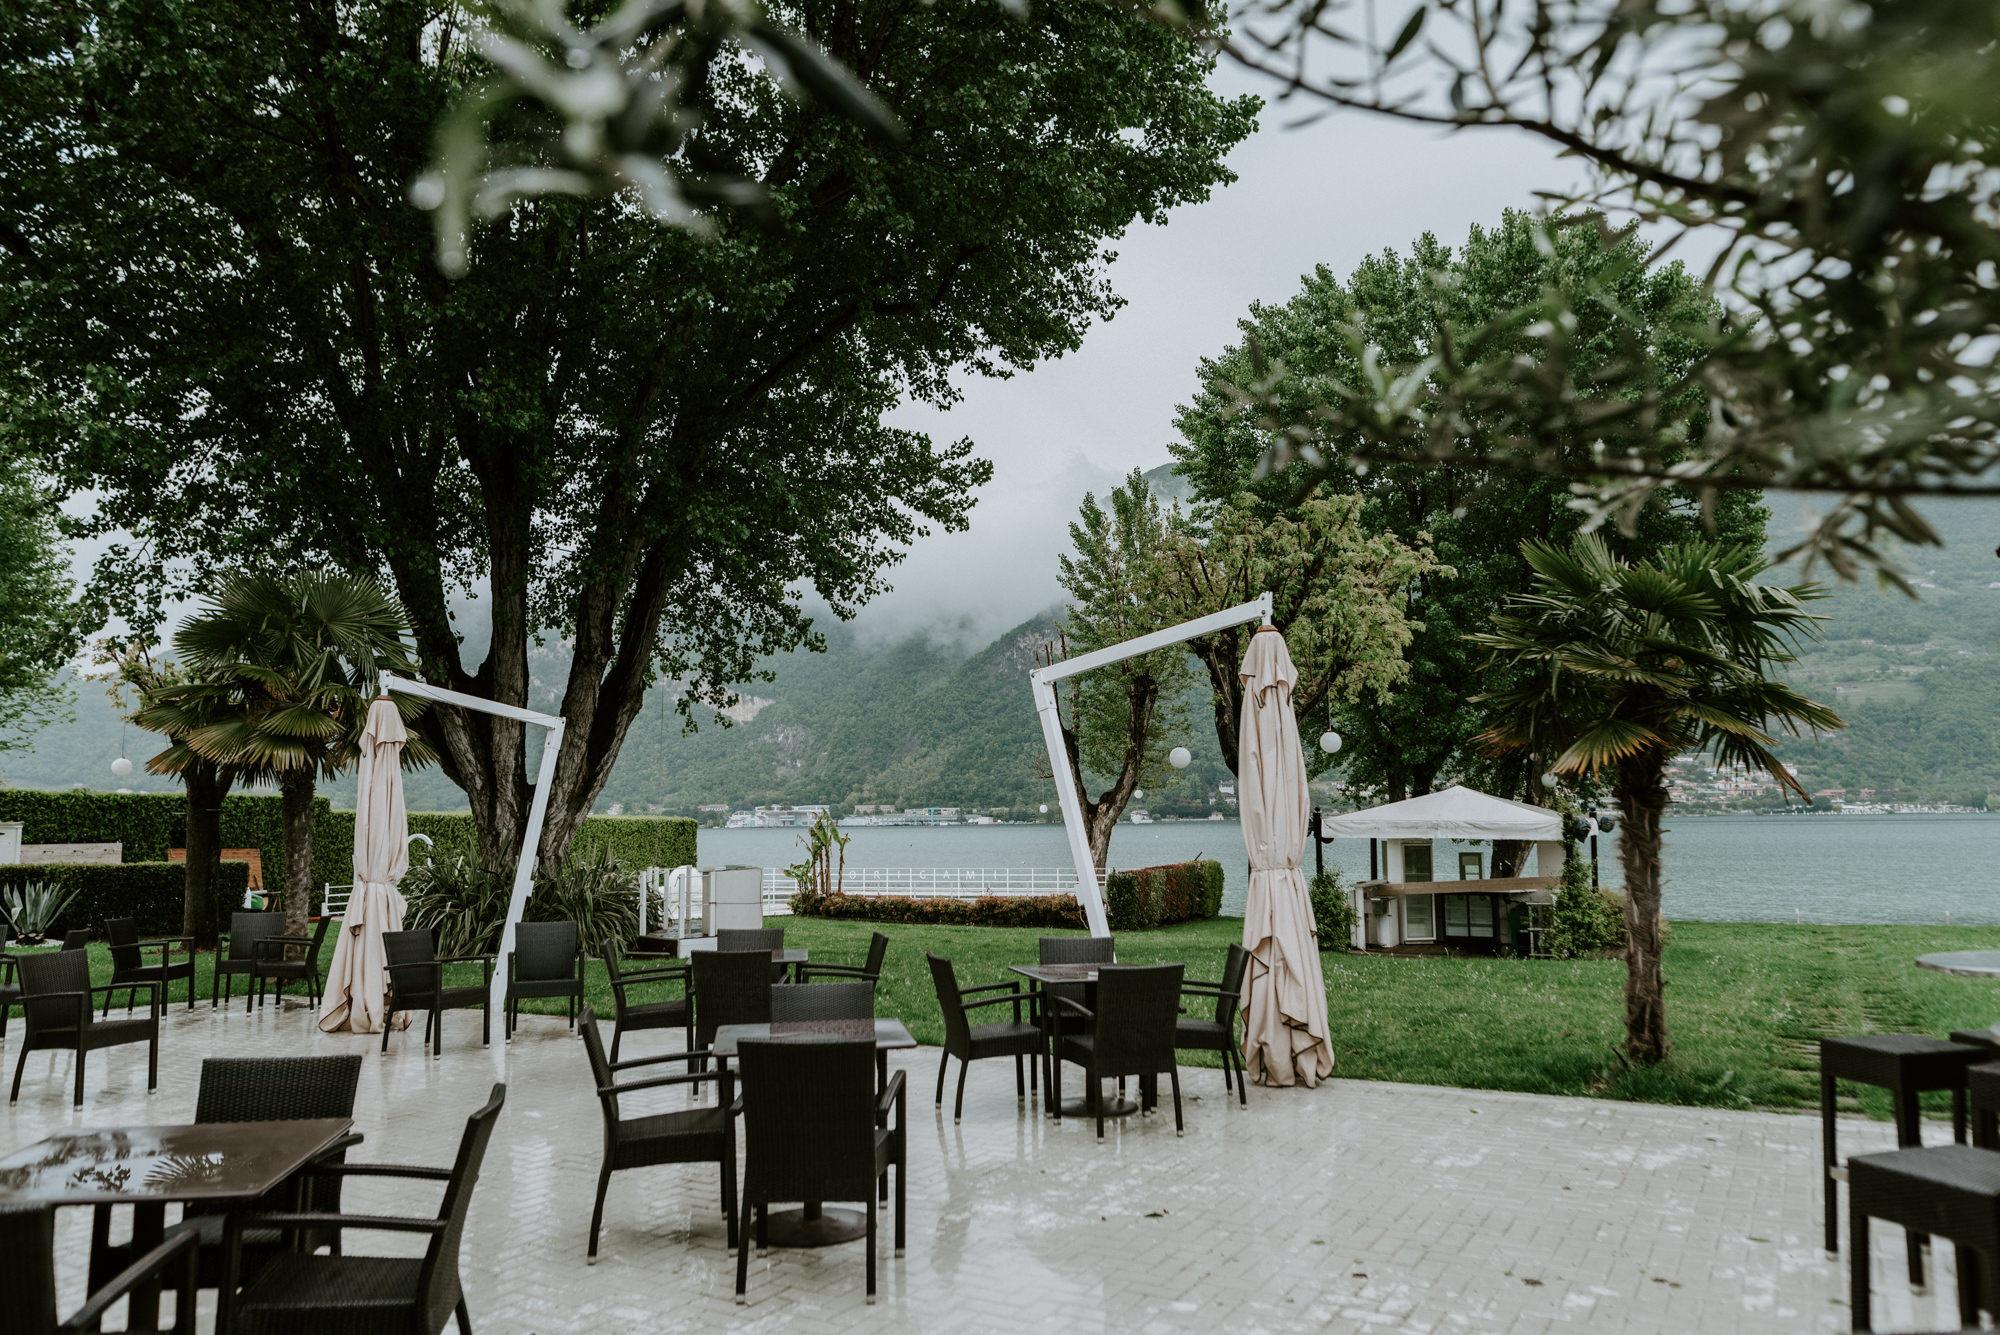 FOTO+PHOTO+BODA+WEDDING+ITALIA+ITALY+MAURICIO+GARAY+MAURICIOGARAY+WEDDINPHOTOGRAPHER+FOTOGRAFODEBODA-2370.jpg